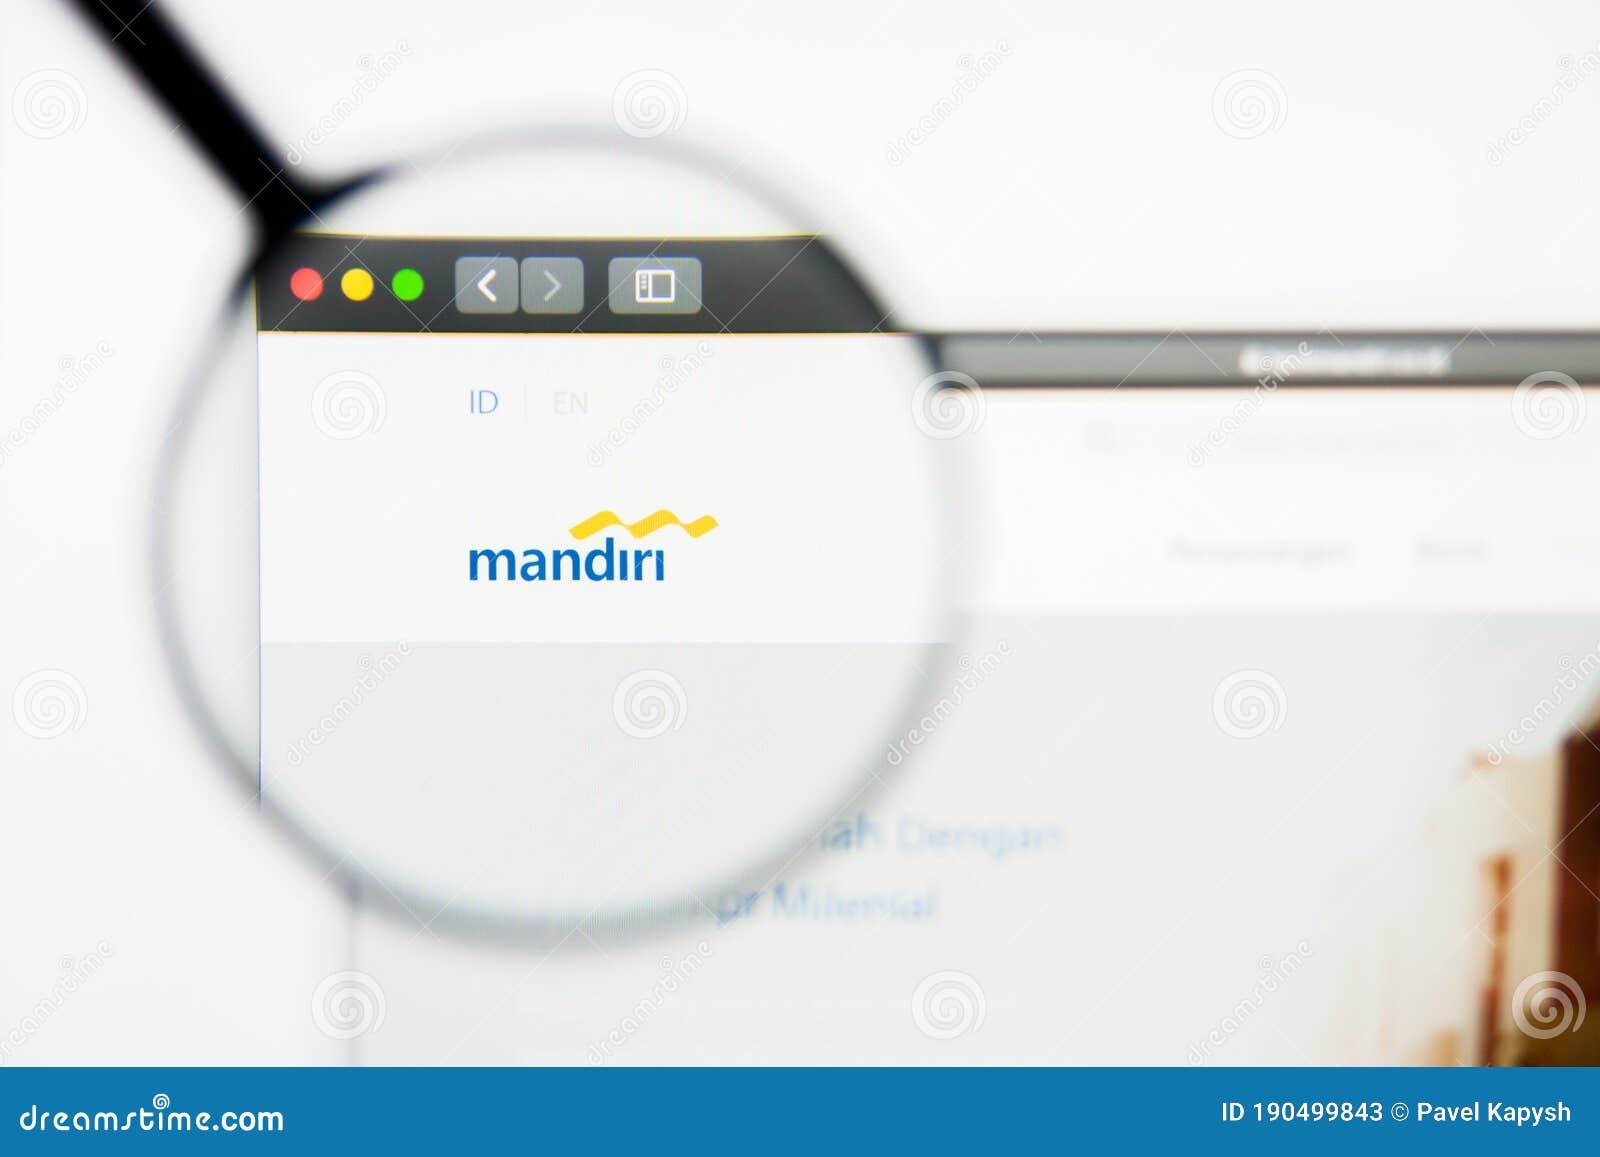 Mandiri Logo Photos Free Royalty Free Stock Photos From Dreamstime